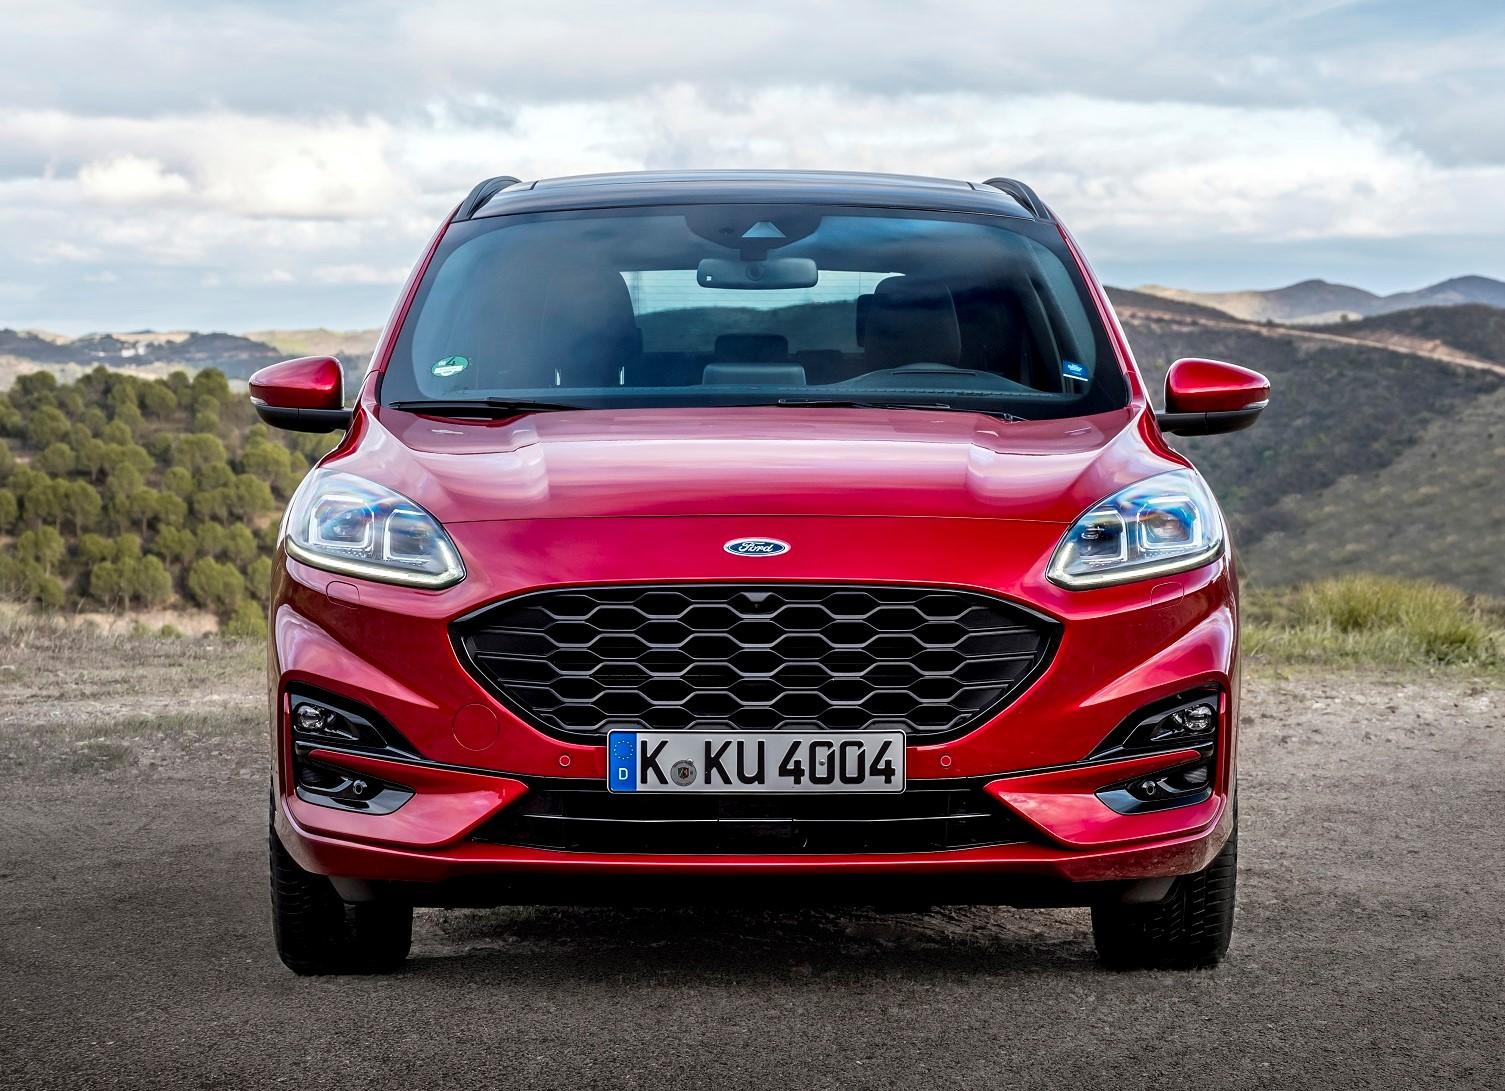 nuova Ford Kuga frontale